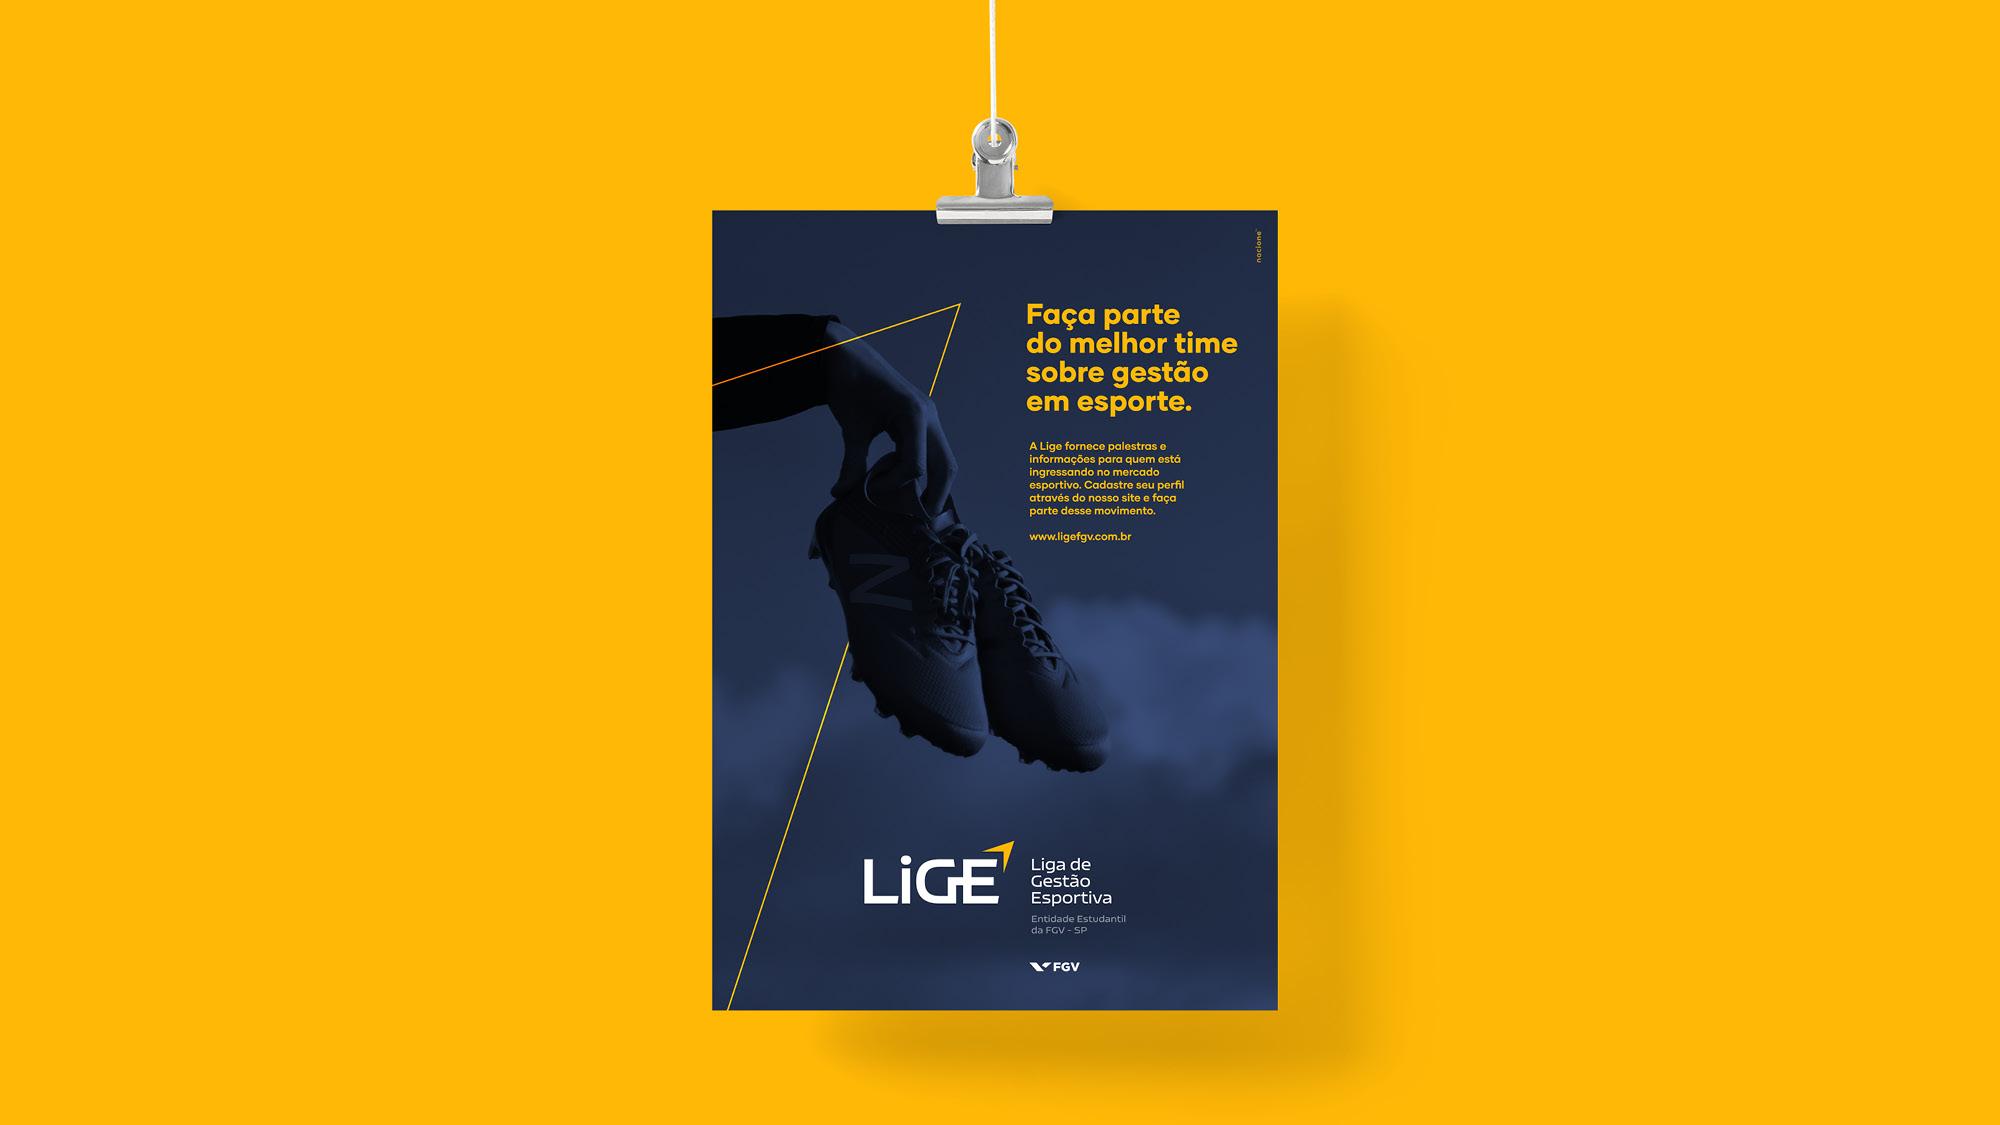 Lige-FGV-SP-Nacione-Branding13